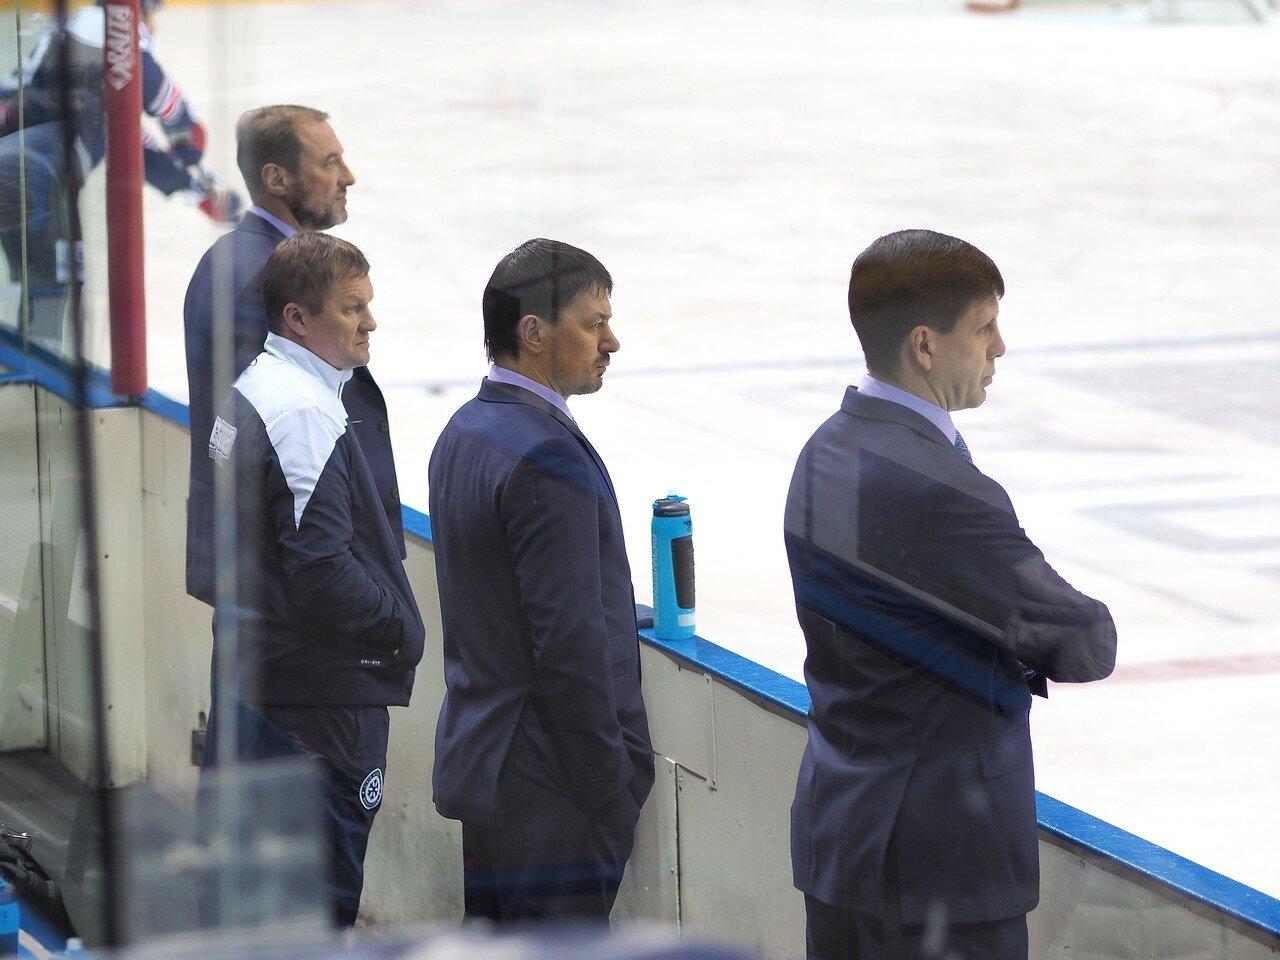 20Плей-офф 2016 Восток 1/2 Металлург - Сибирь 10.03.2016